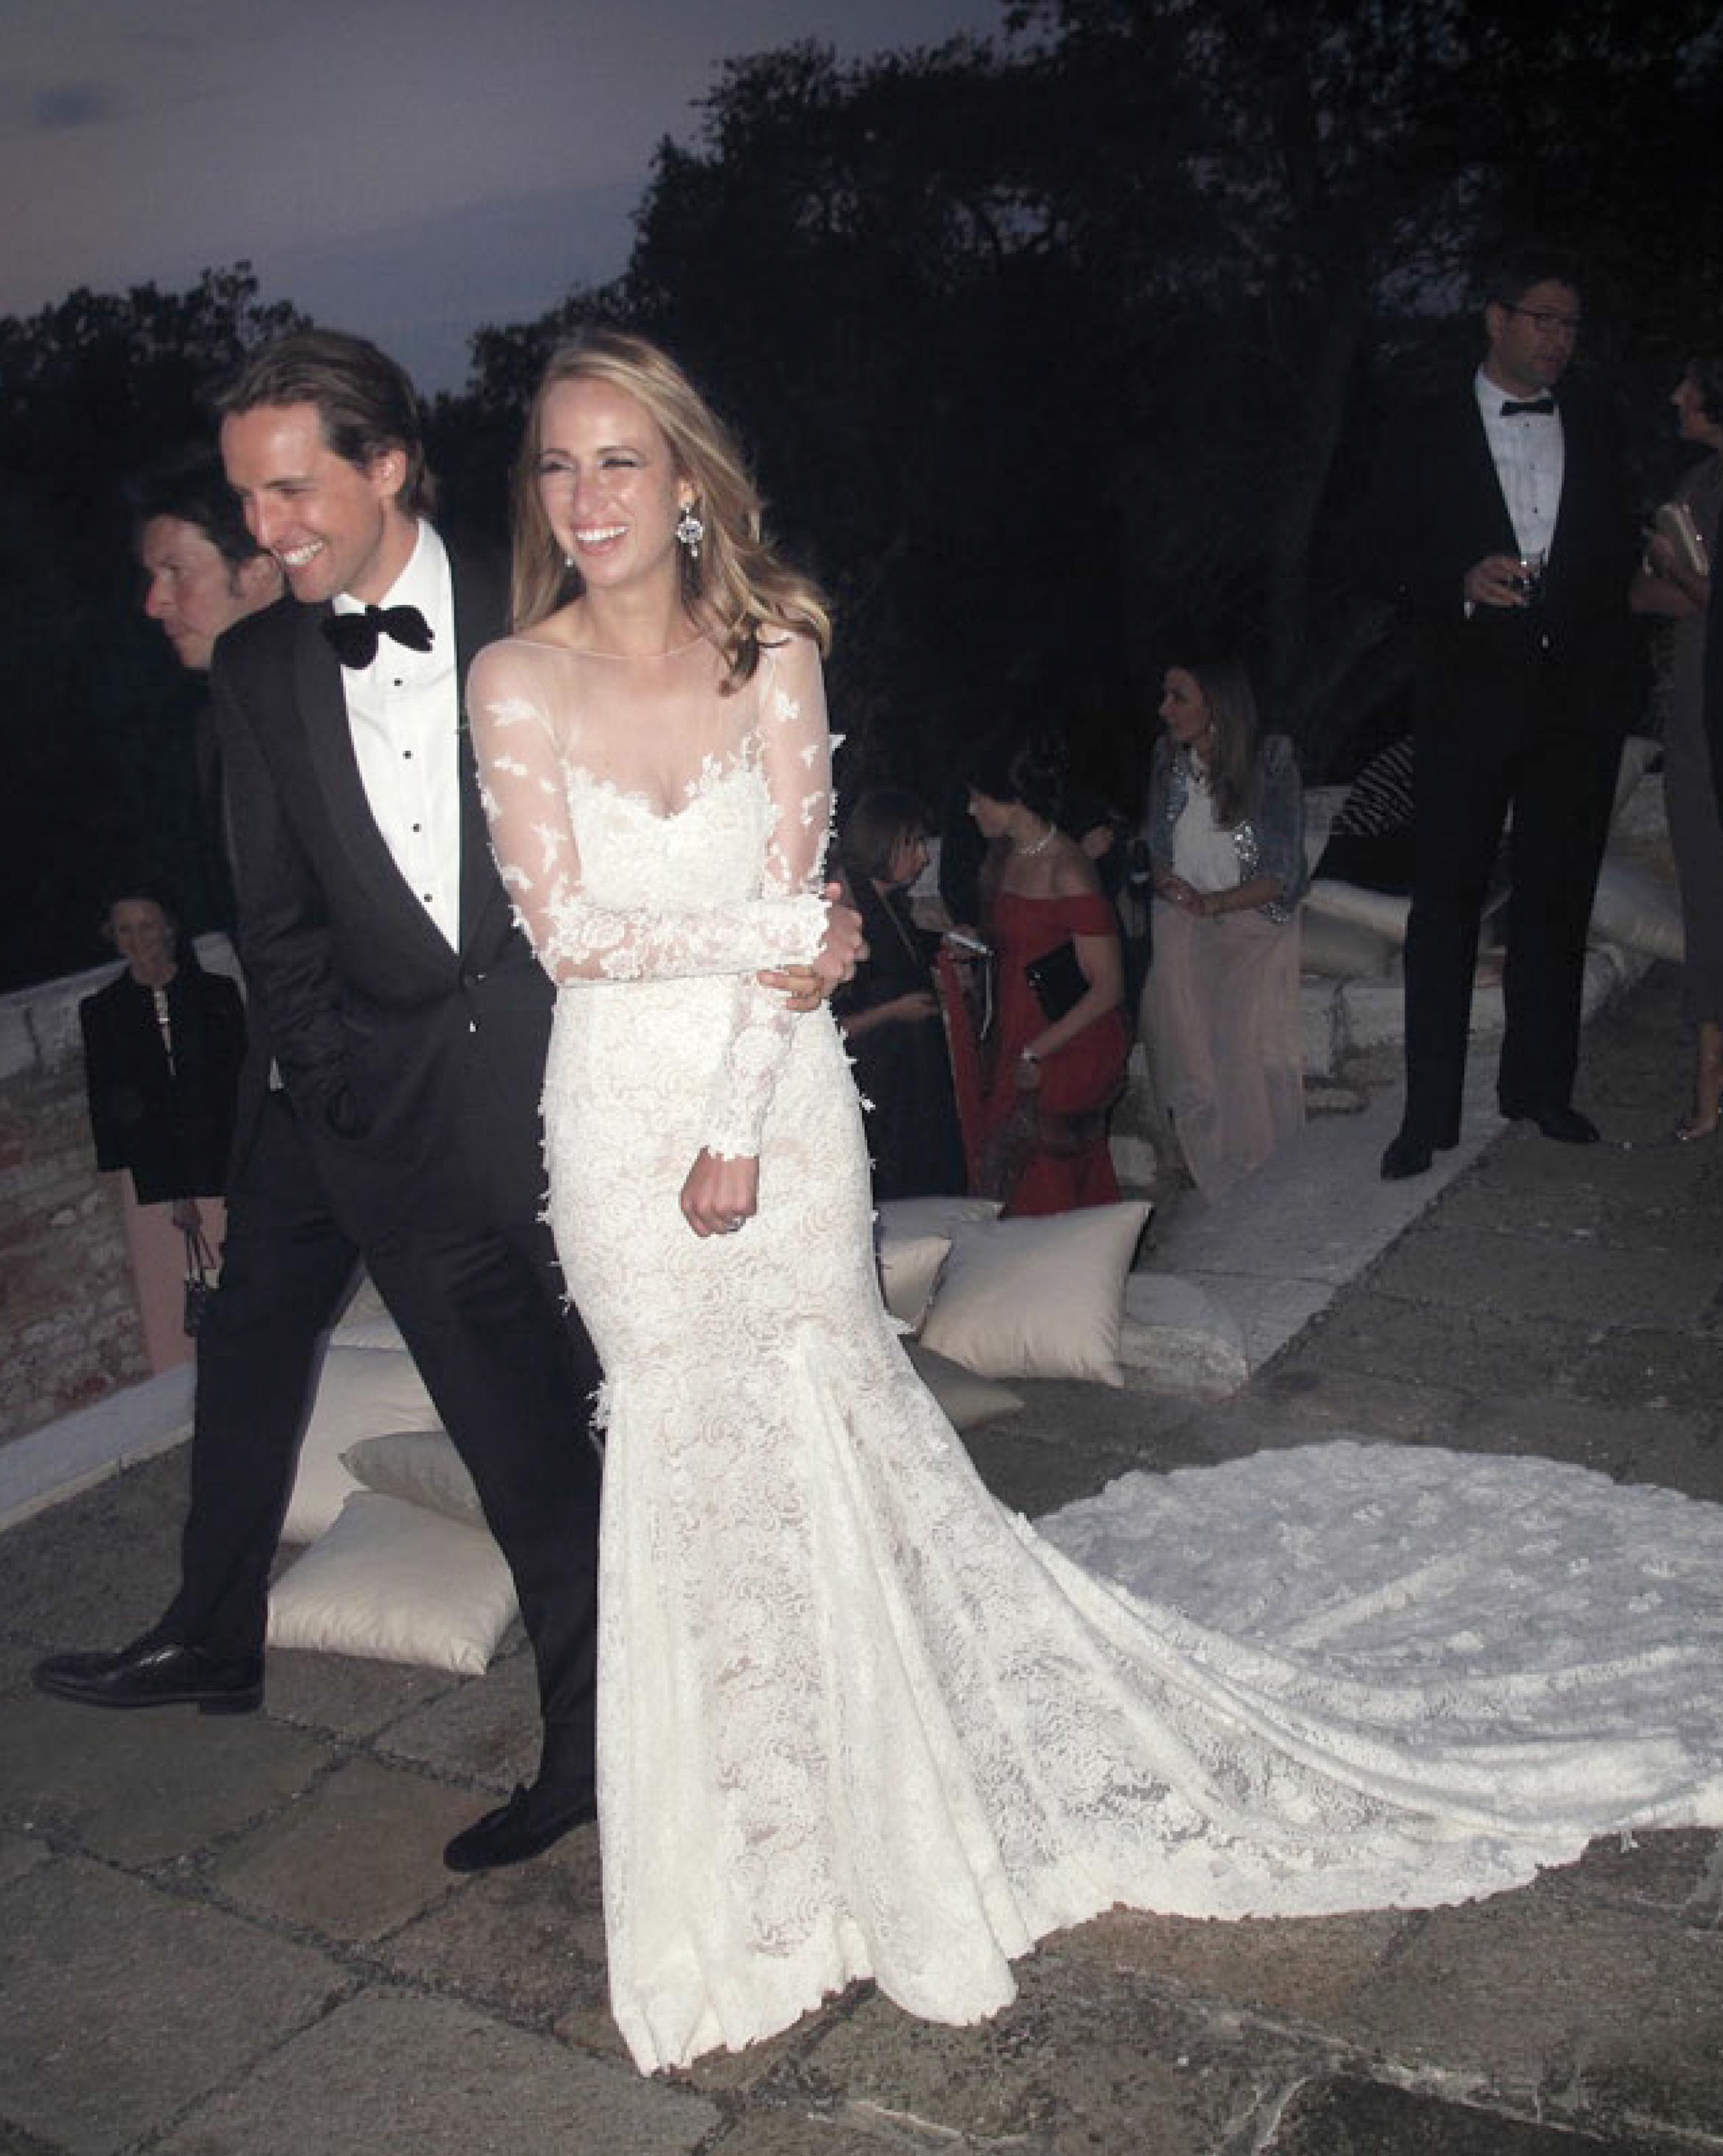 n-wedding-s112480.jpg